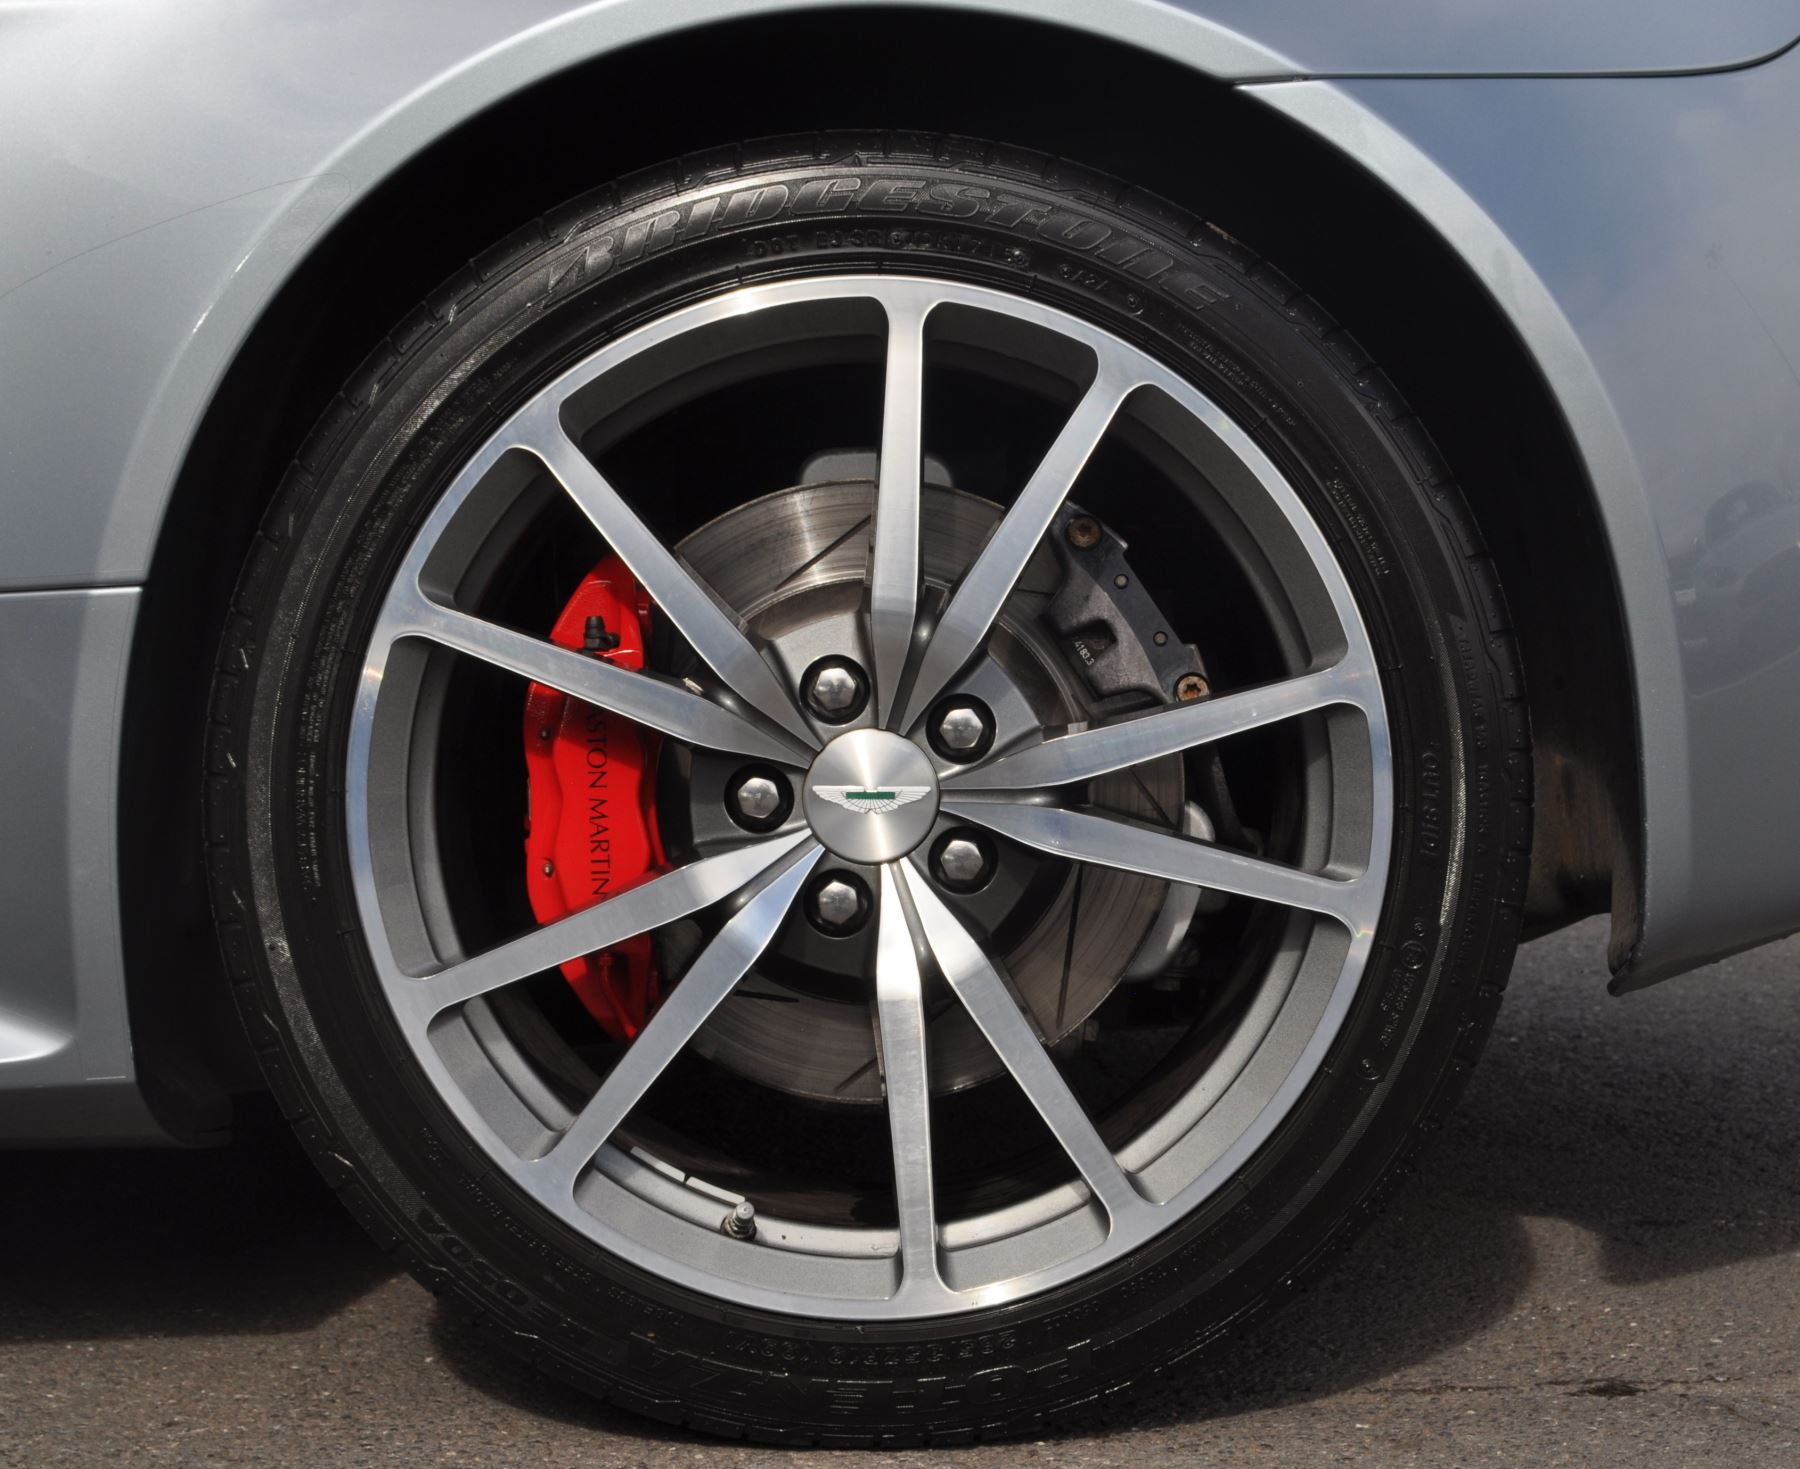 Aston Martin V8 Vantage S Coupe Coupe image 39